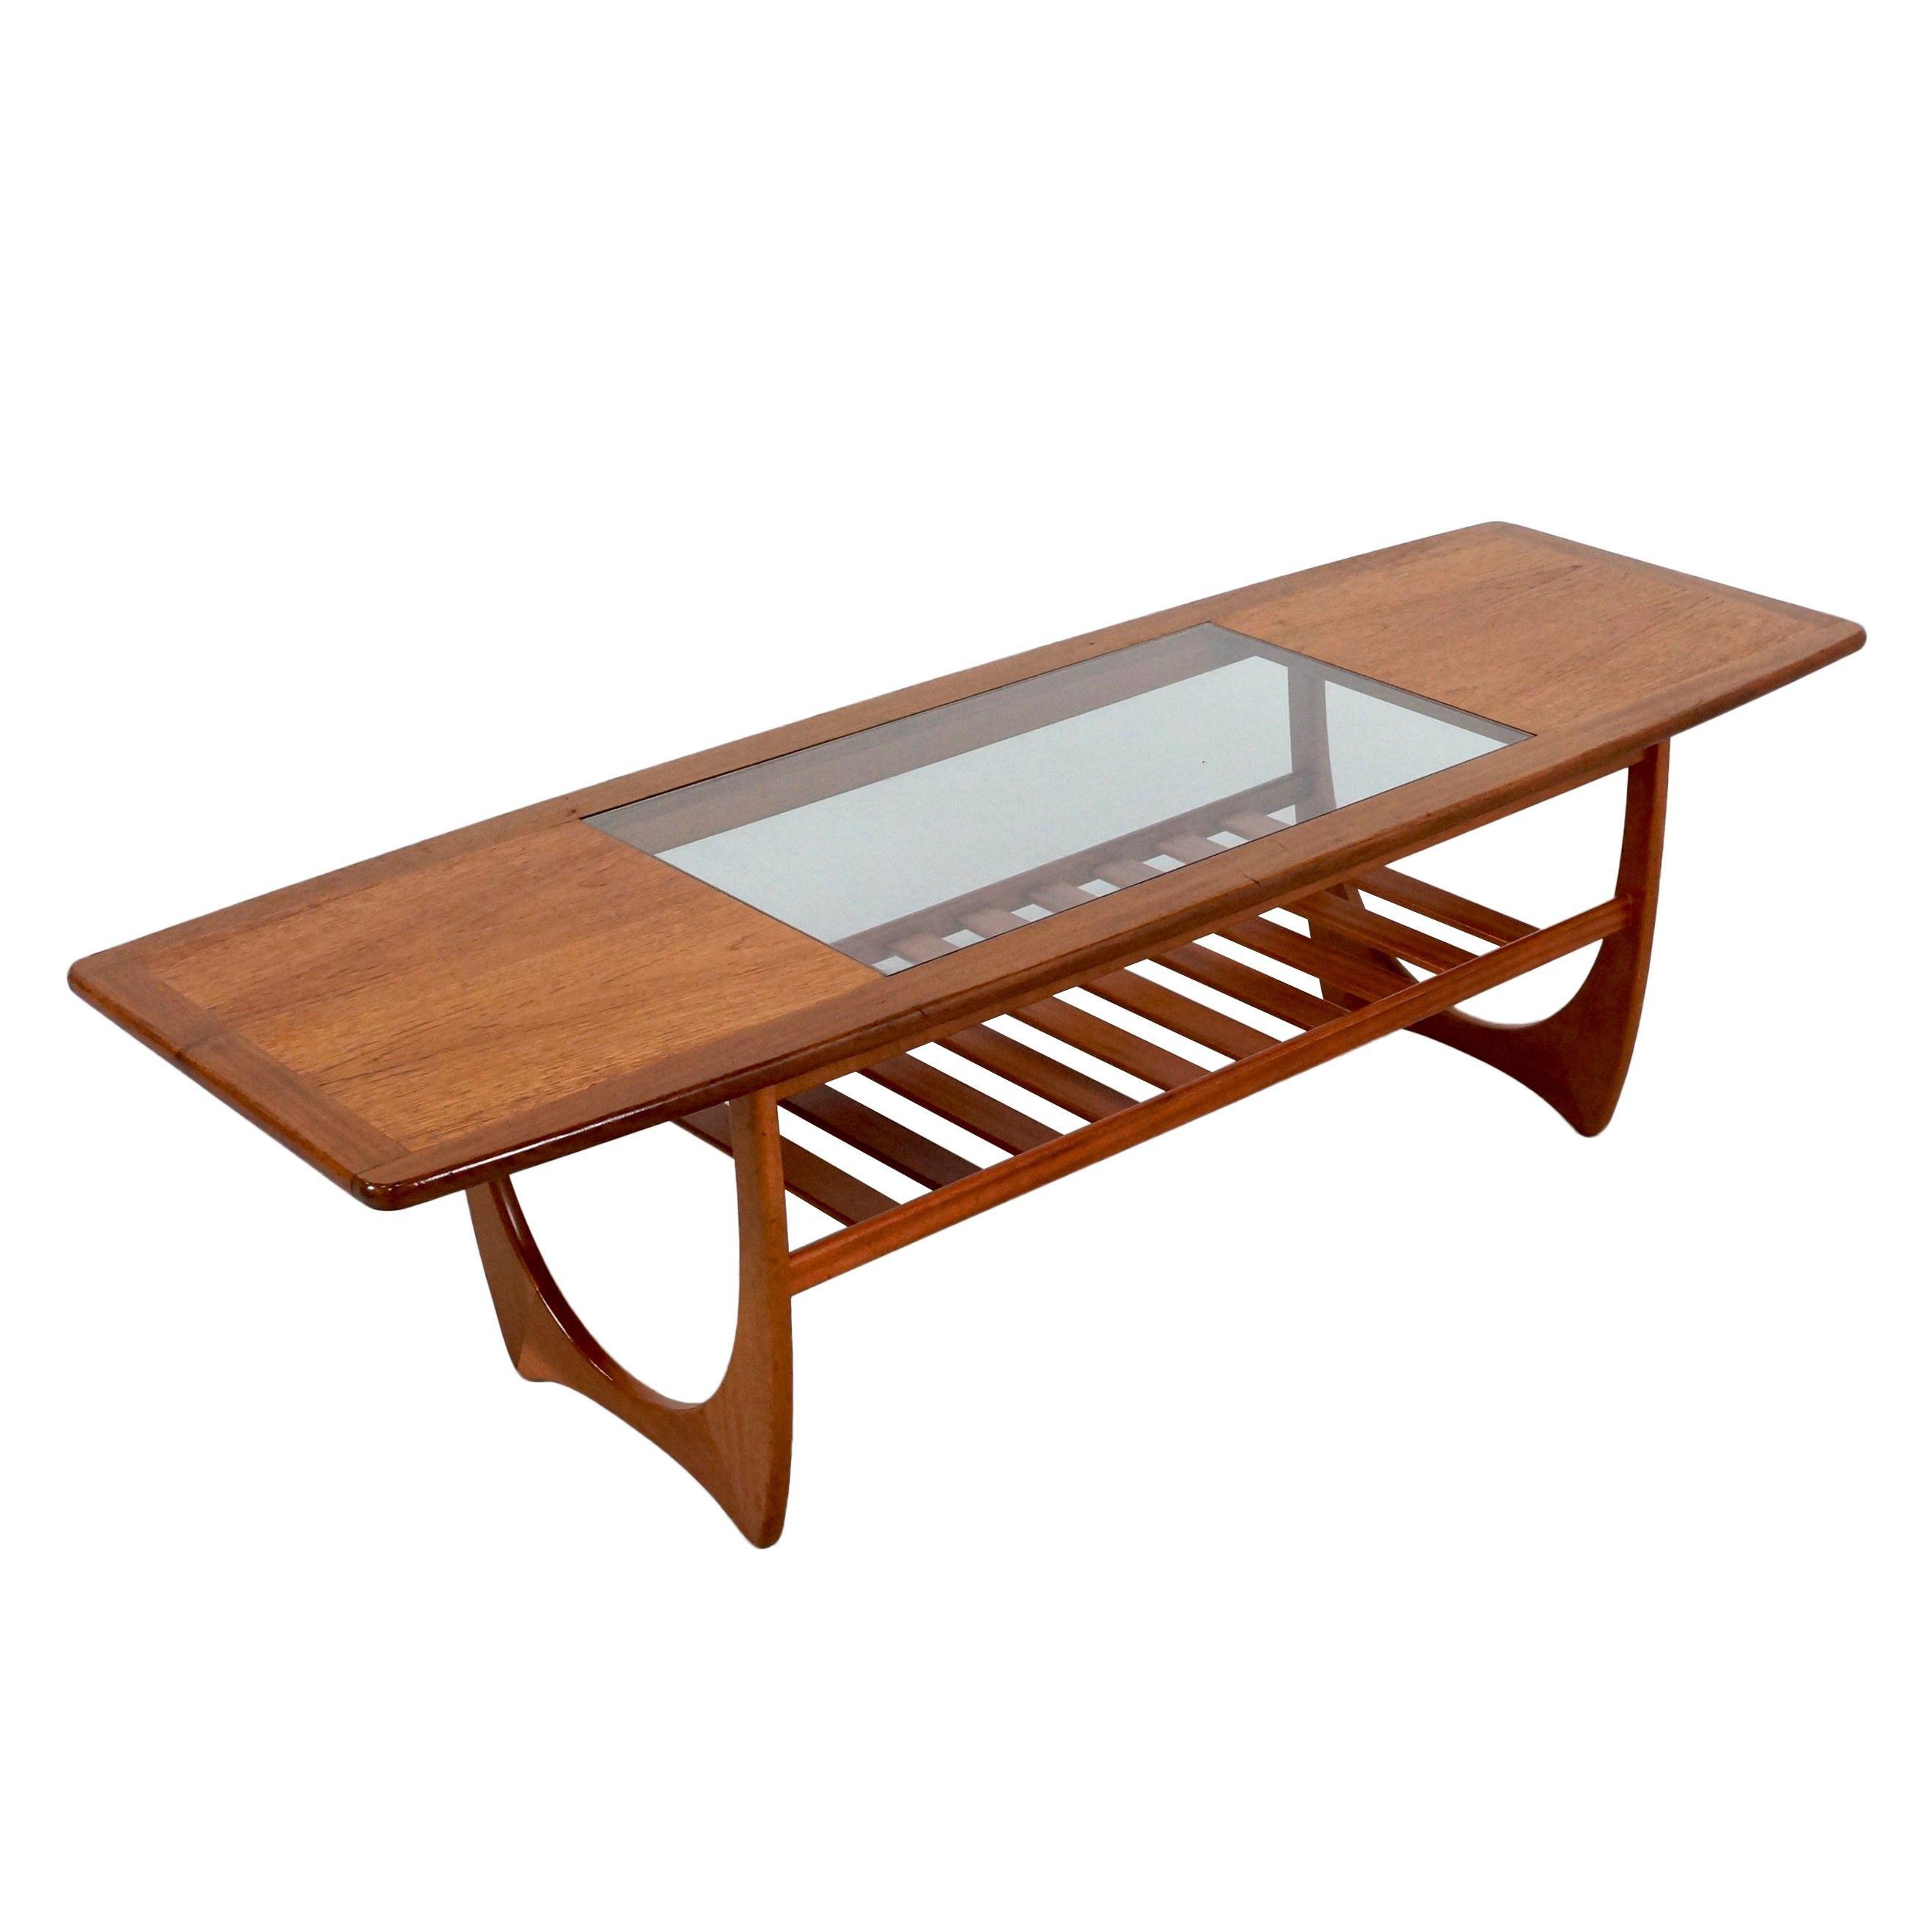 Pg plan long john fresco coffee table in teak slatted shelf pg plan long john fresco coffee table in teak slatted shelf underneath geotapseo Choice Image